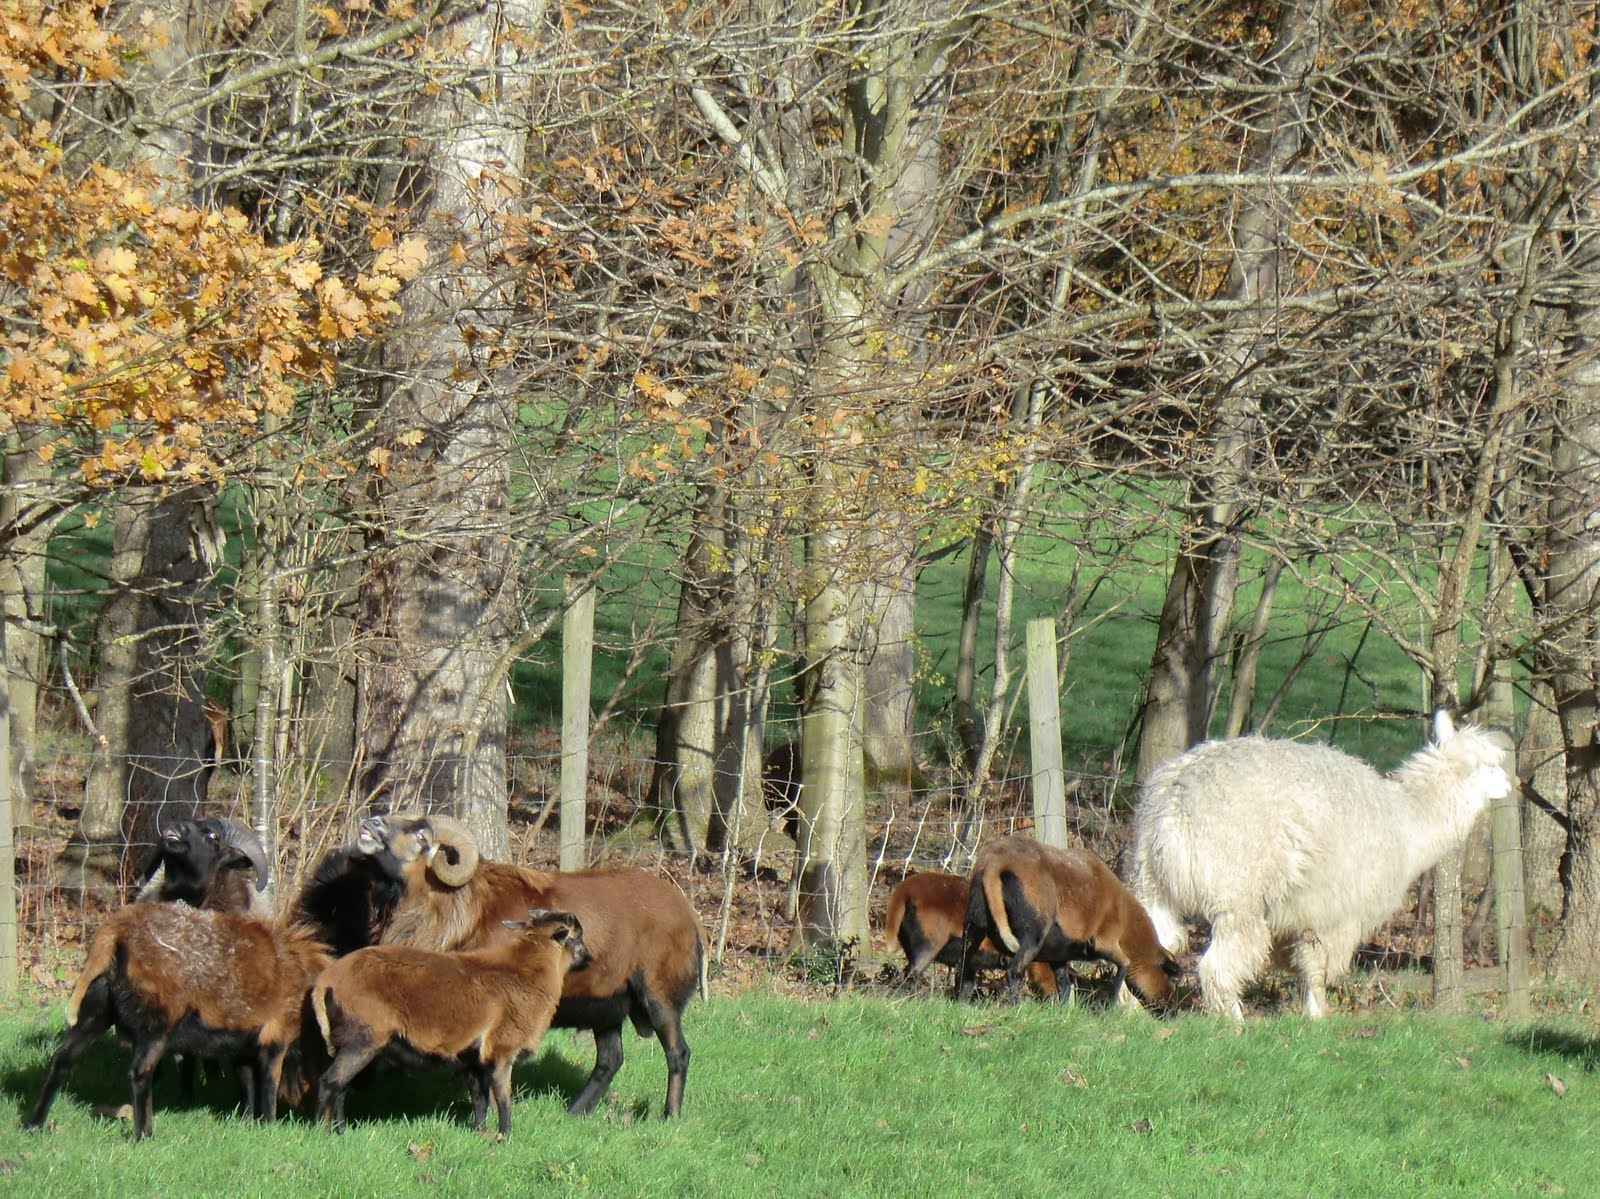 CIMG1700 A llama guards a flock of sheep in Groombridge